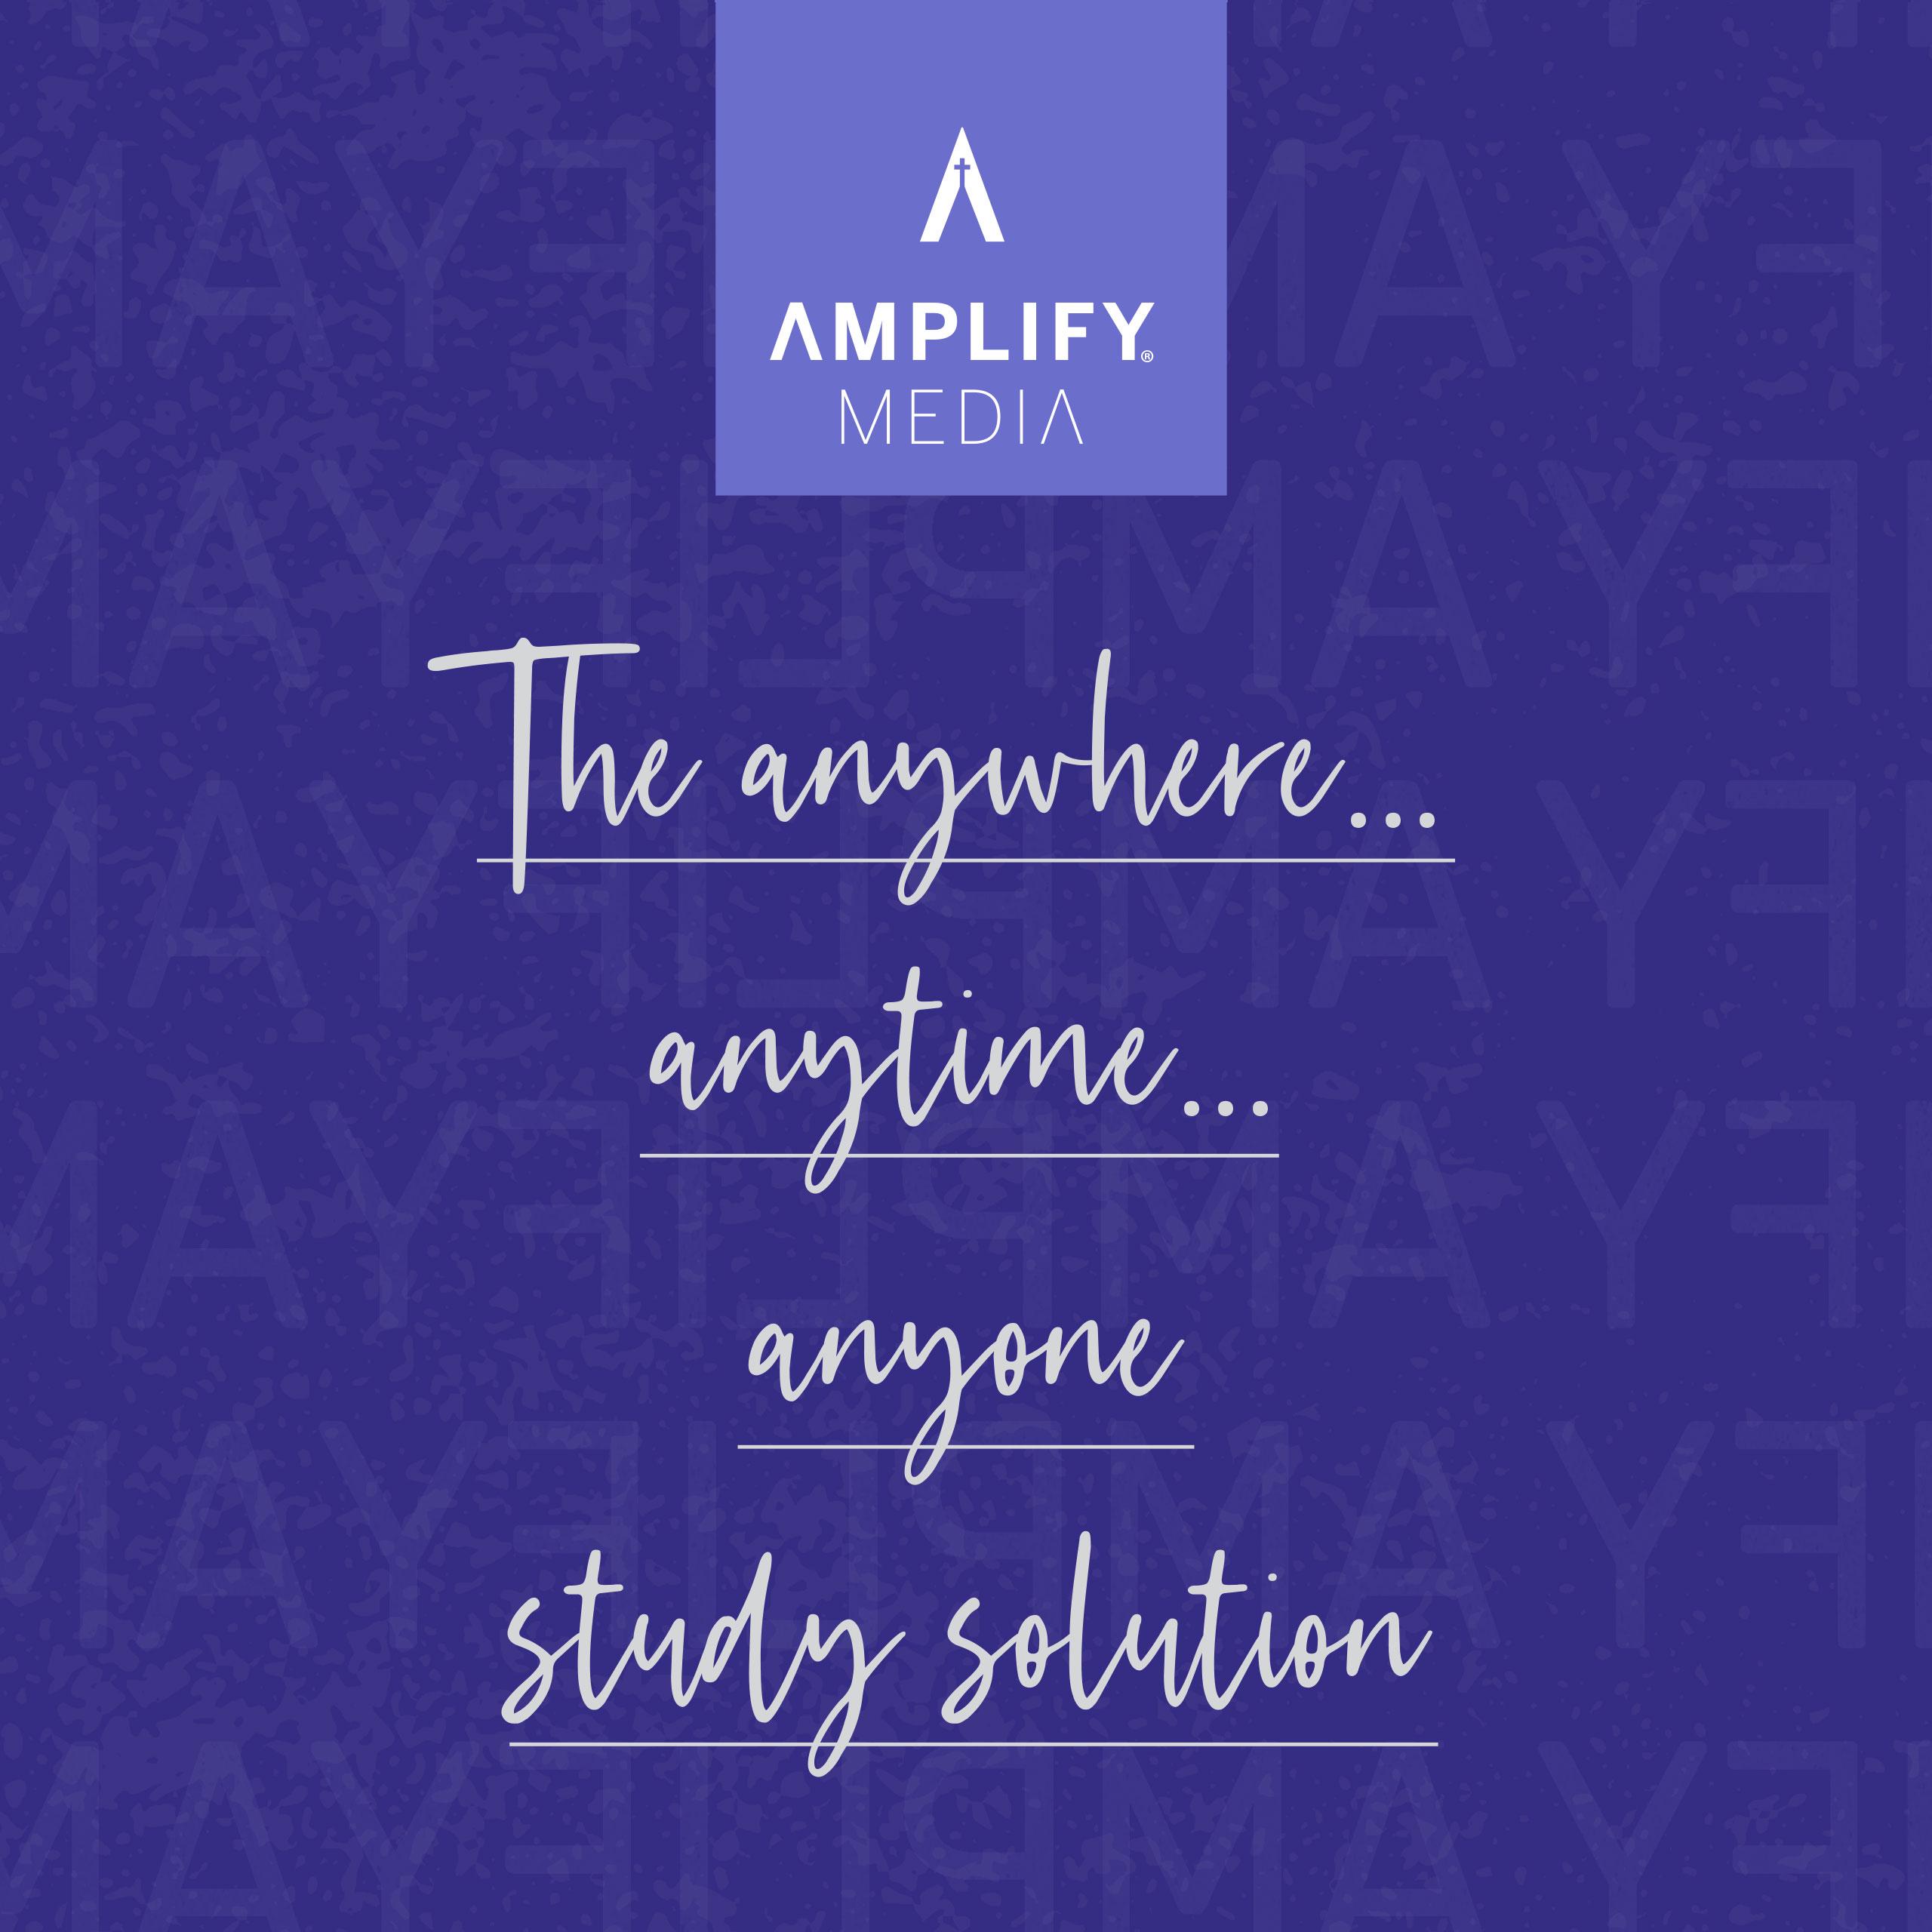 Amplify-Media-Digital-Planning-Guide-Cover